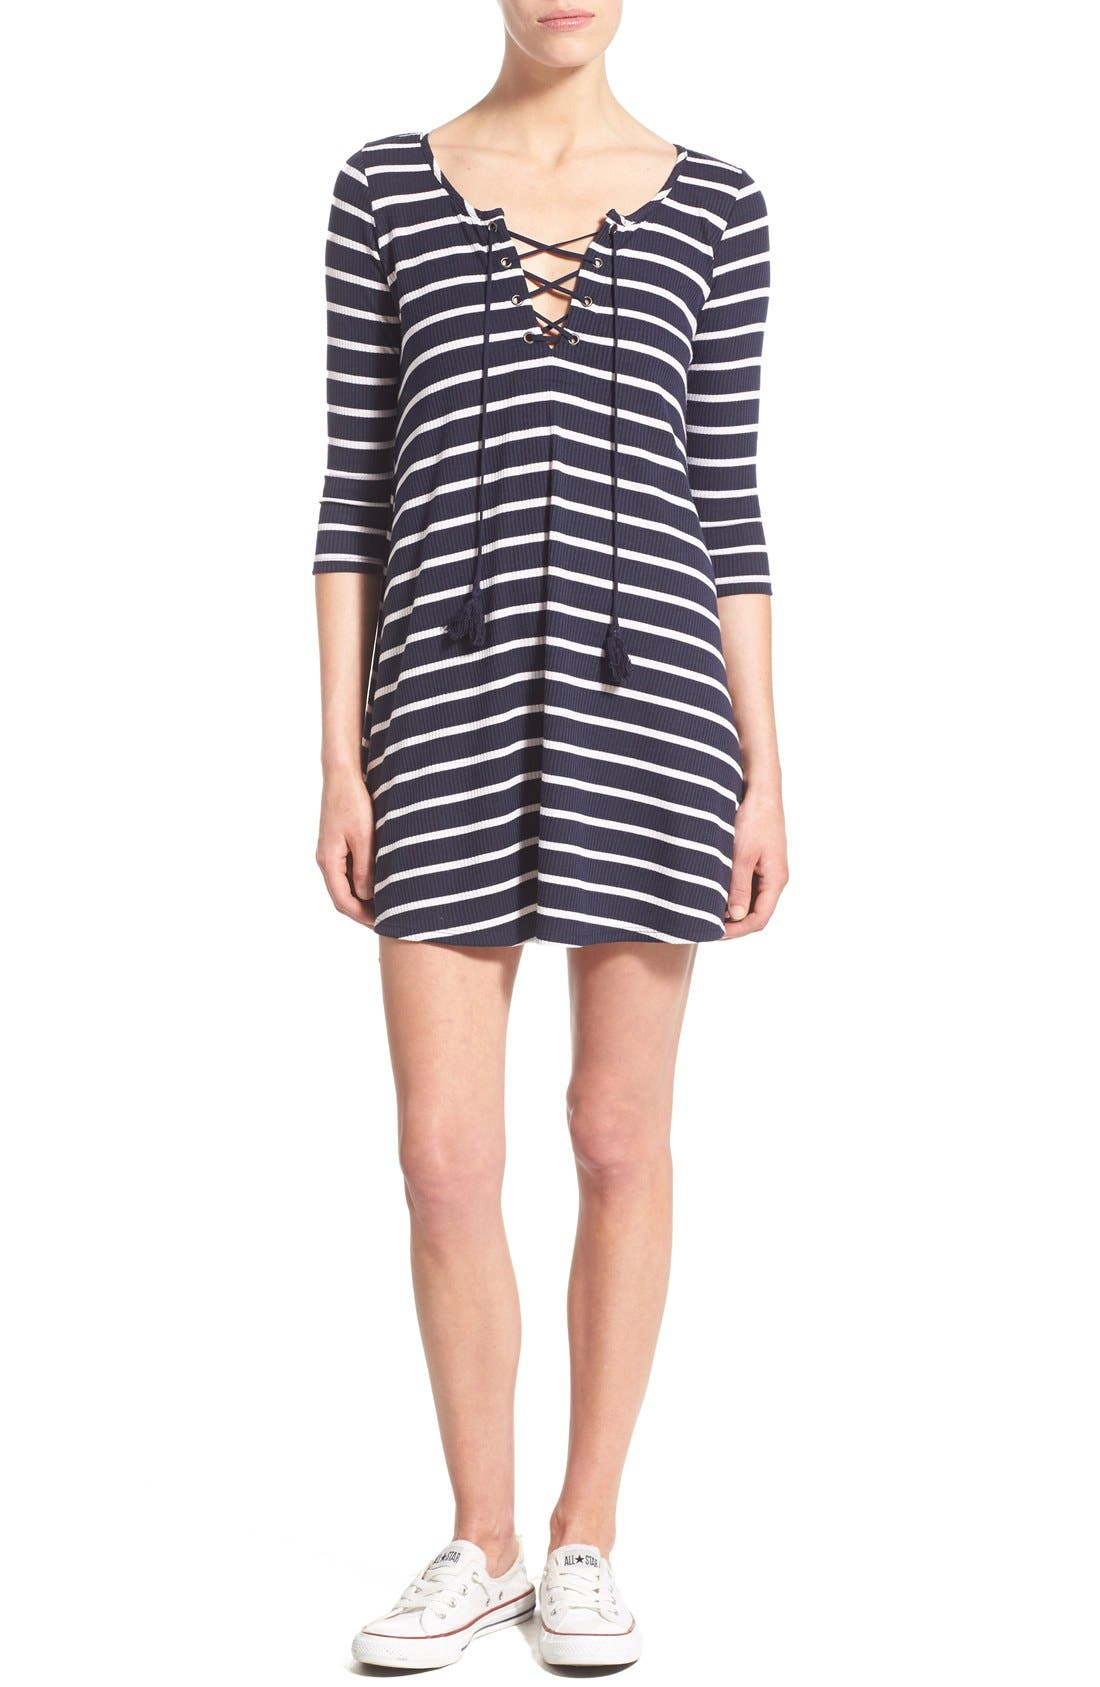 SOCIALITE Stripe Lace-Up Minidress, Main, color, 466